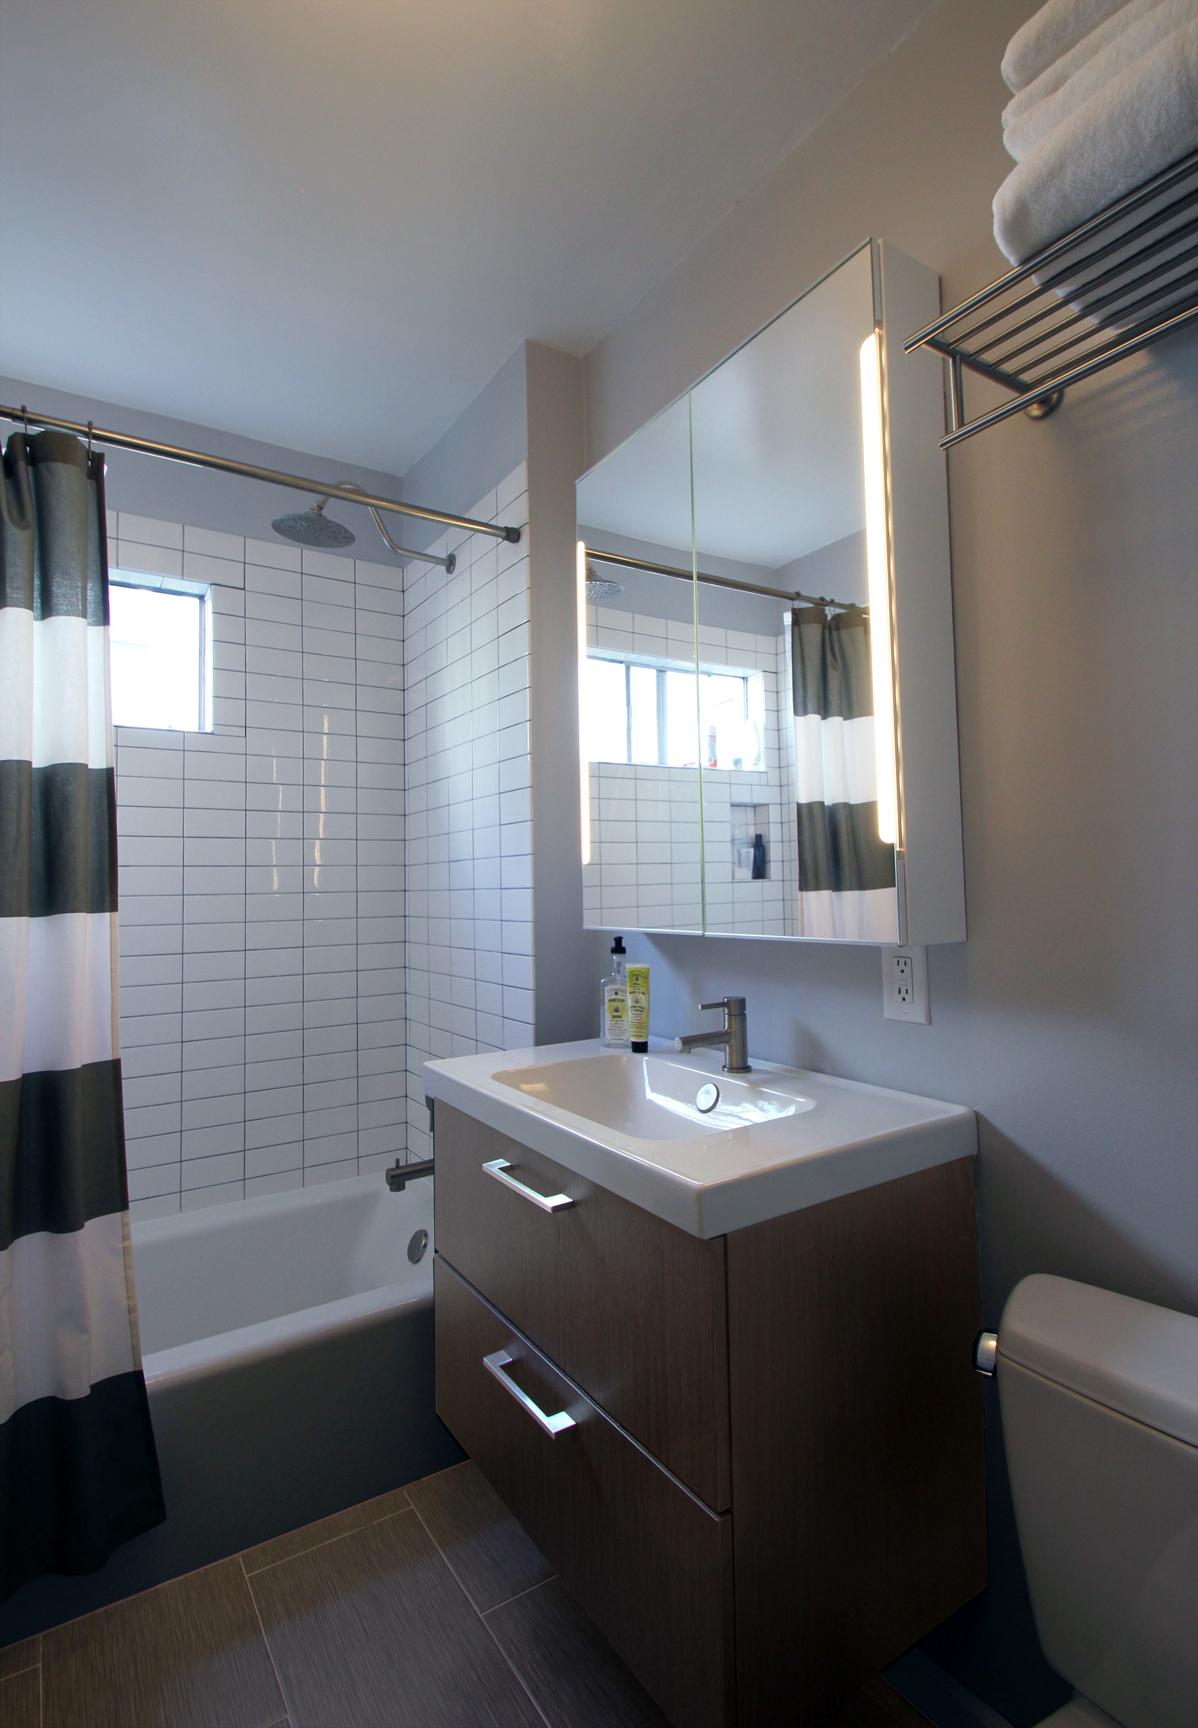 Santa monica kitchen bath renovation clarice zusky for Kitchen and bathroom renovations